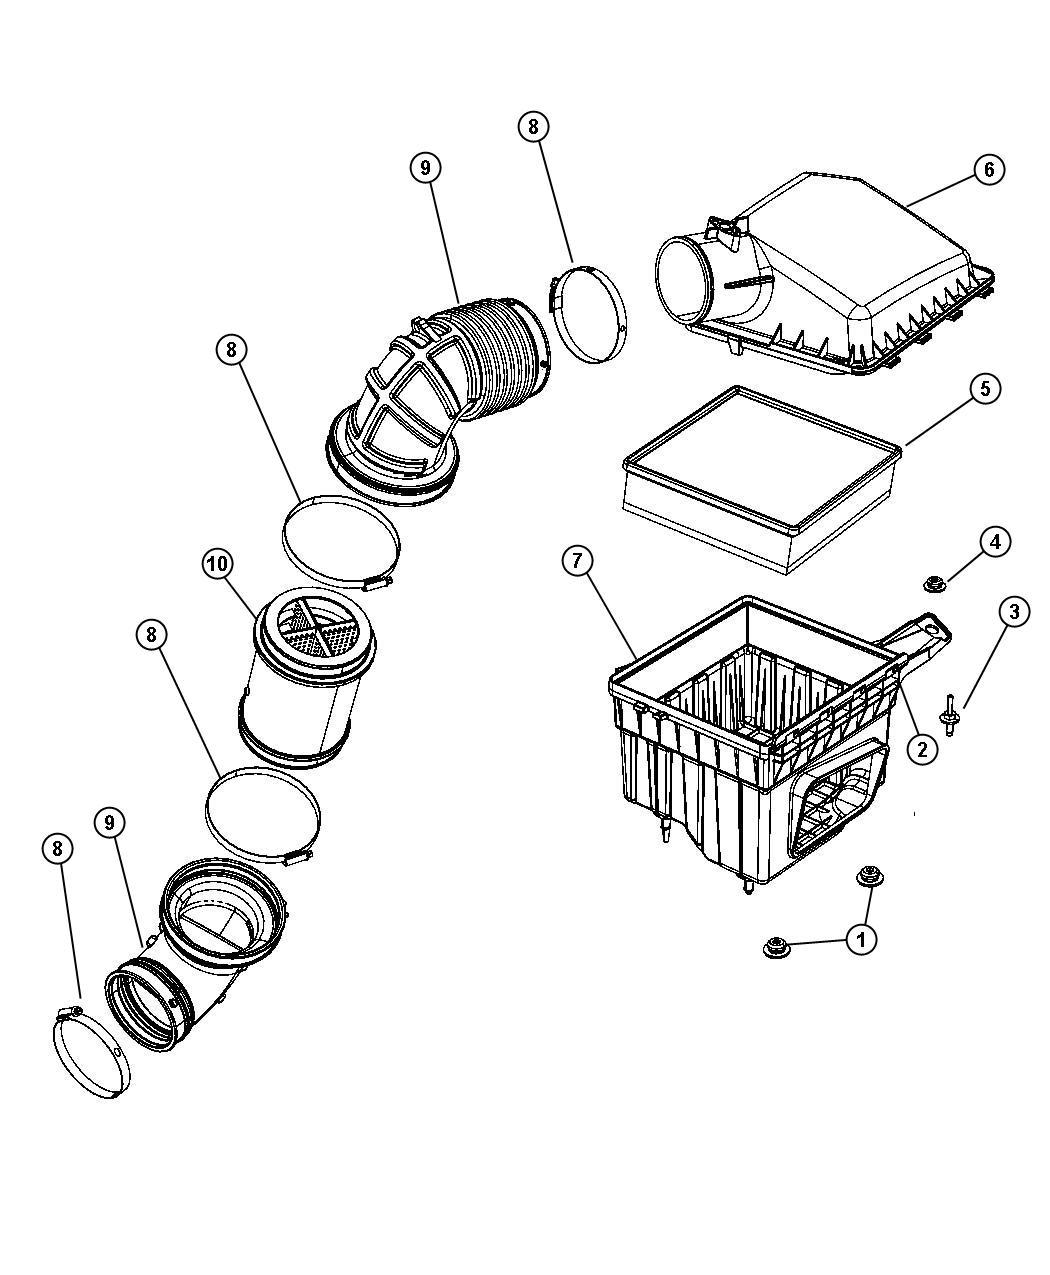 Dodge Ram Body Air Cleaner 6 7l Cummins Turbo